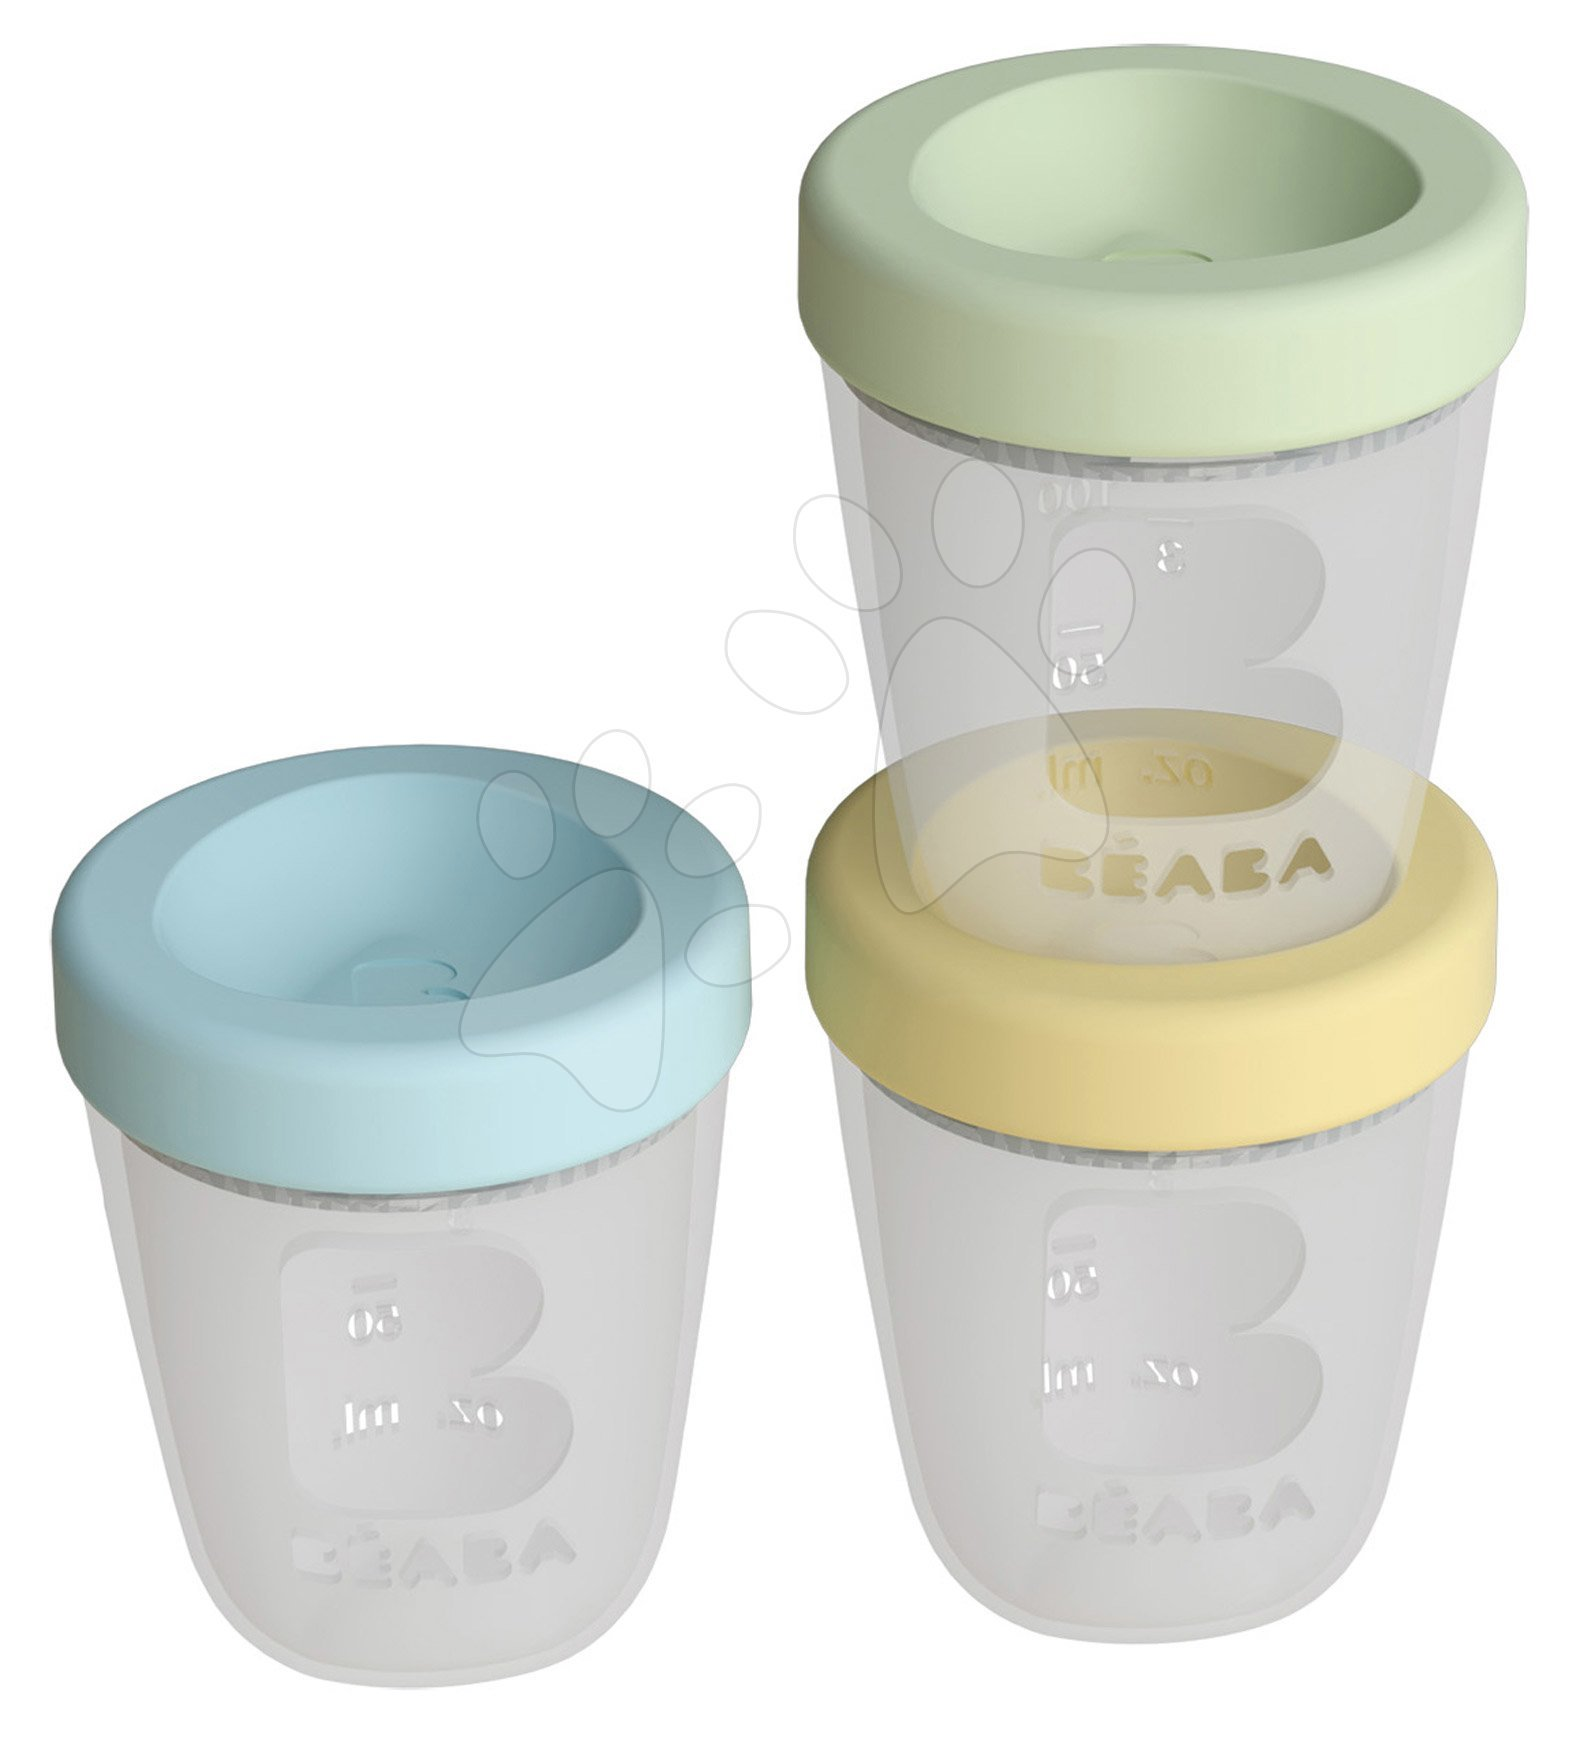 Dóza na jedlo Silicone Portions Beaba Spring silikónové poháre 3x200 ml modrá žltá a zelená od 0 mes